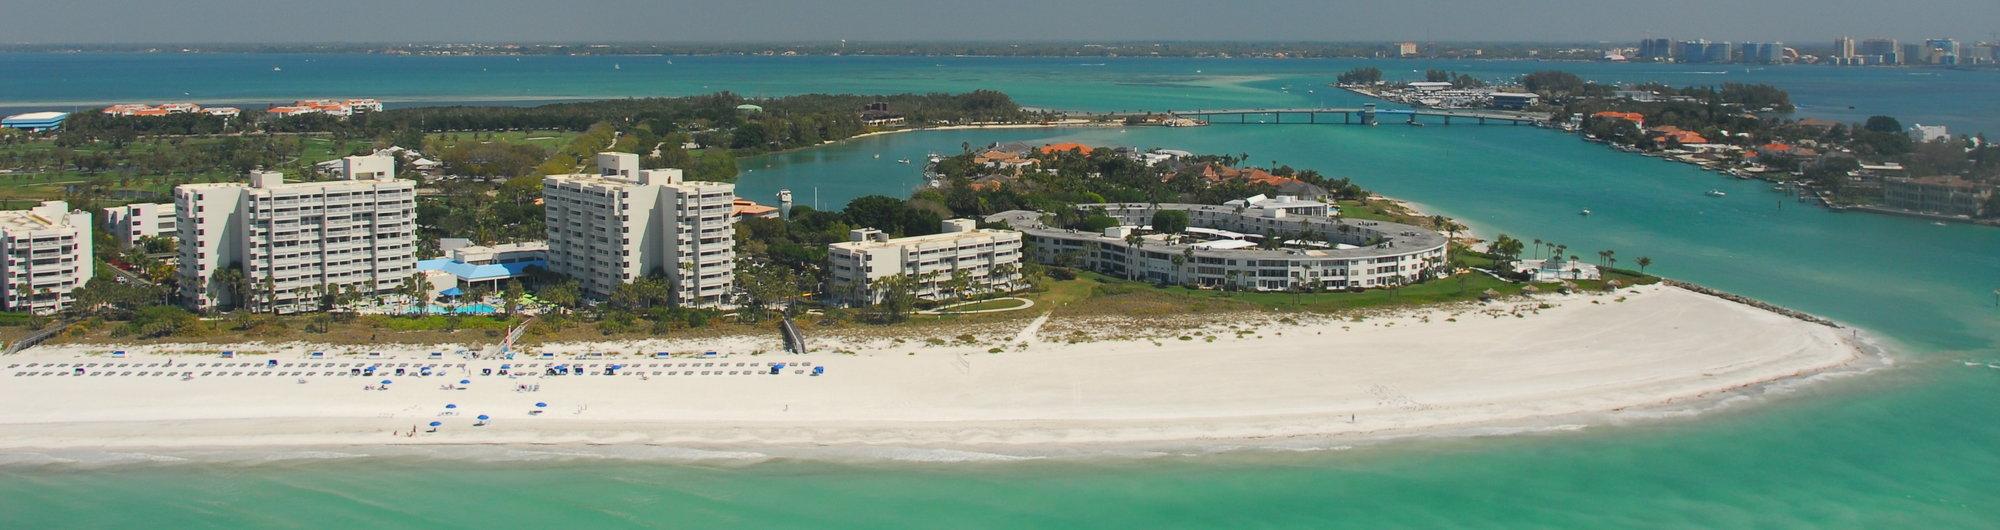 Longboat Key Club Resort Condos